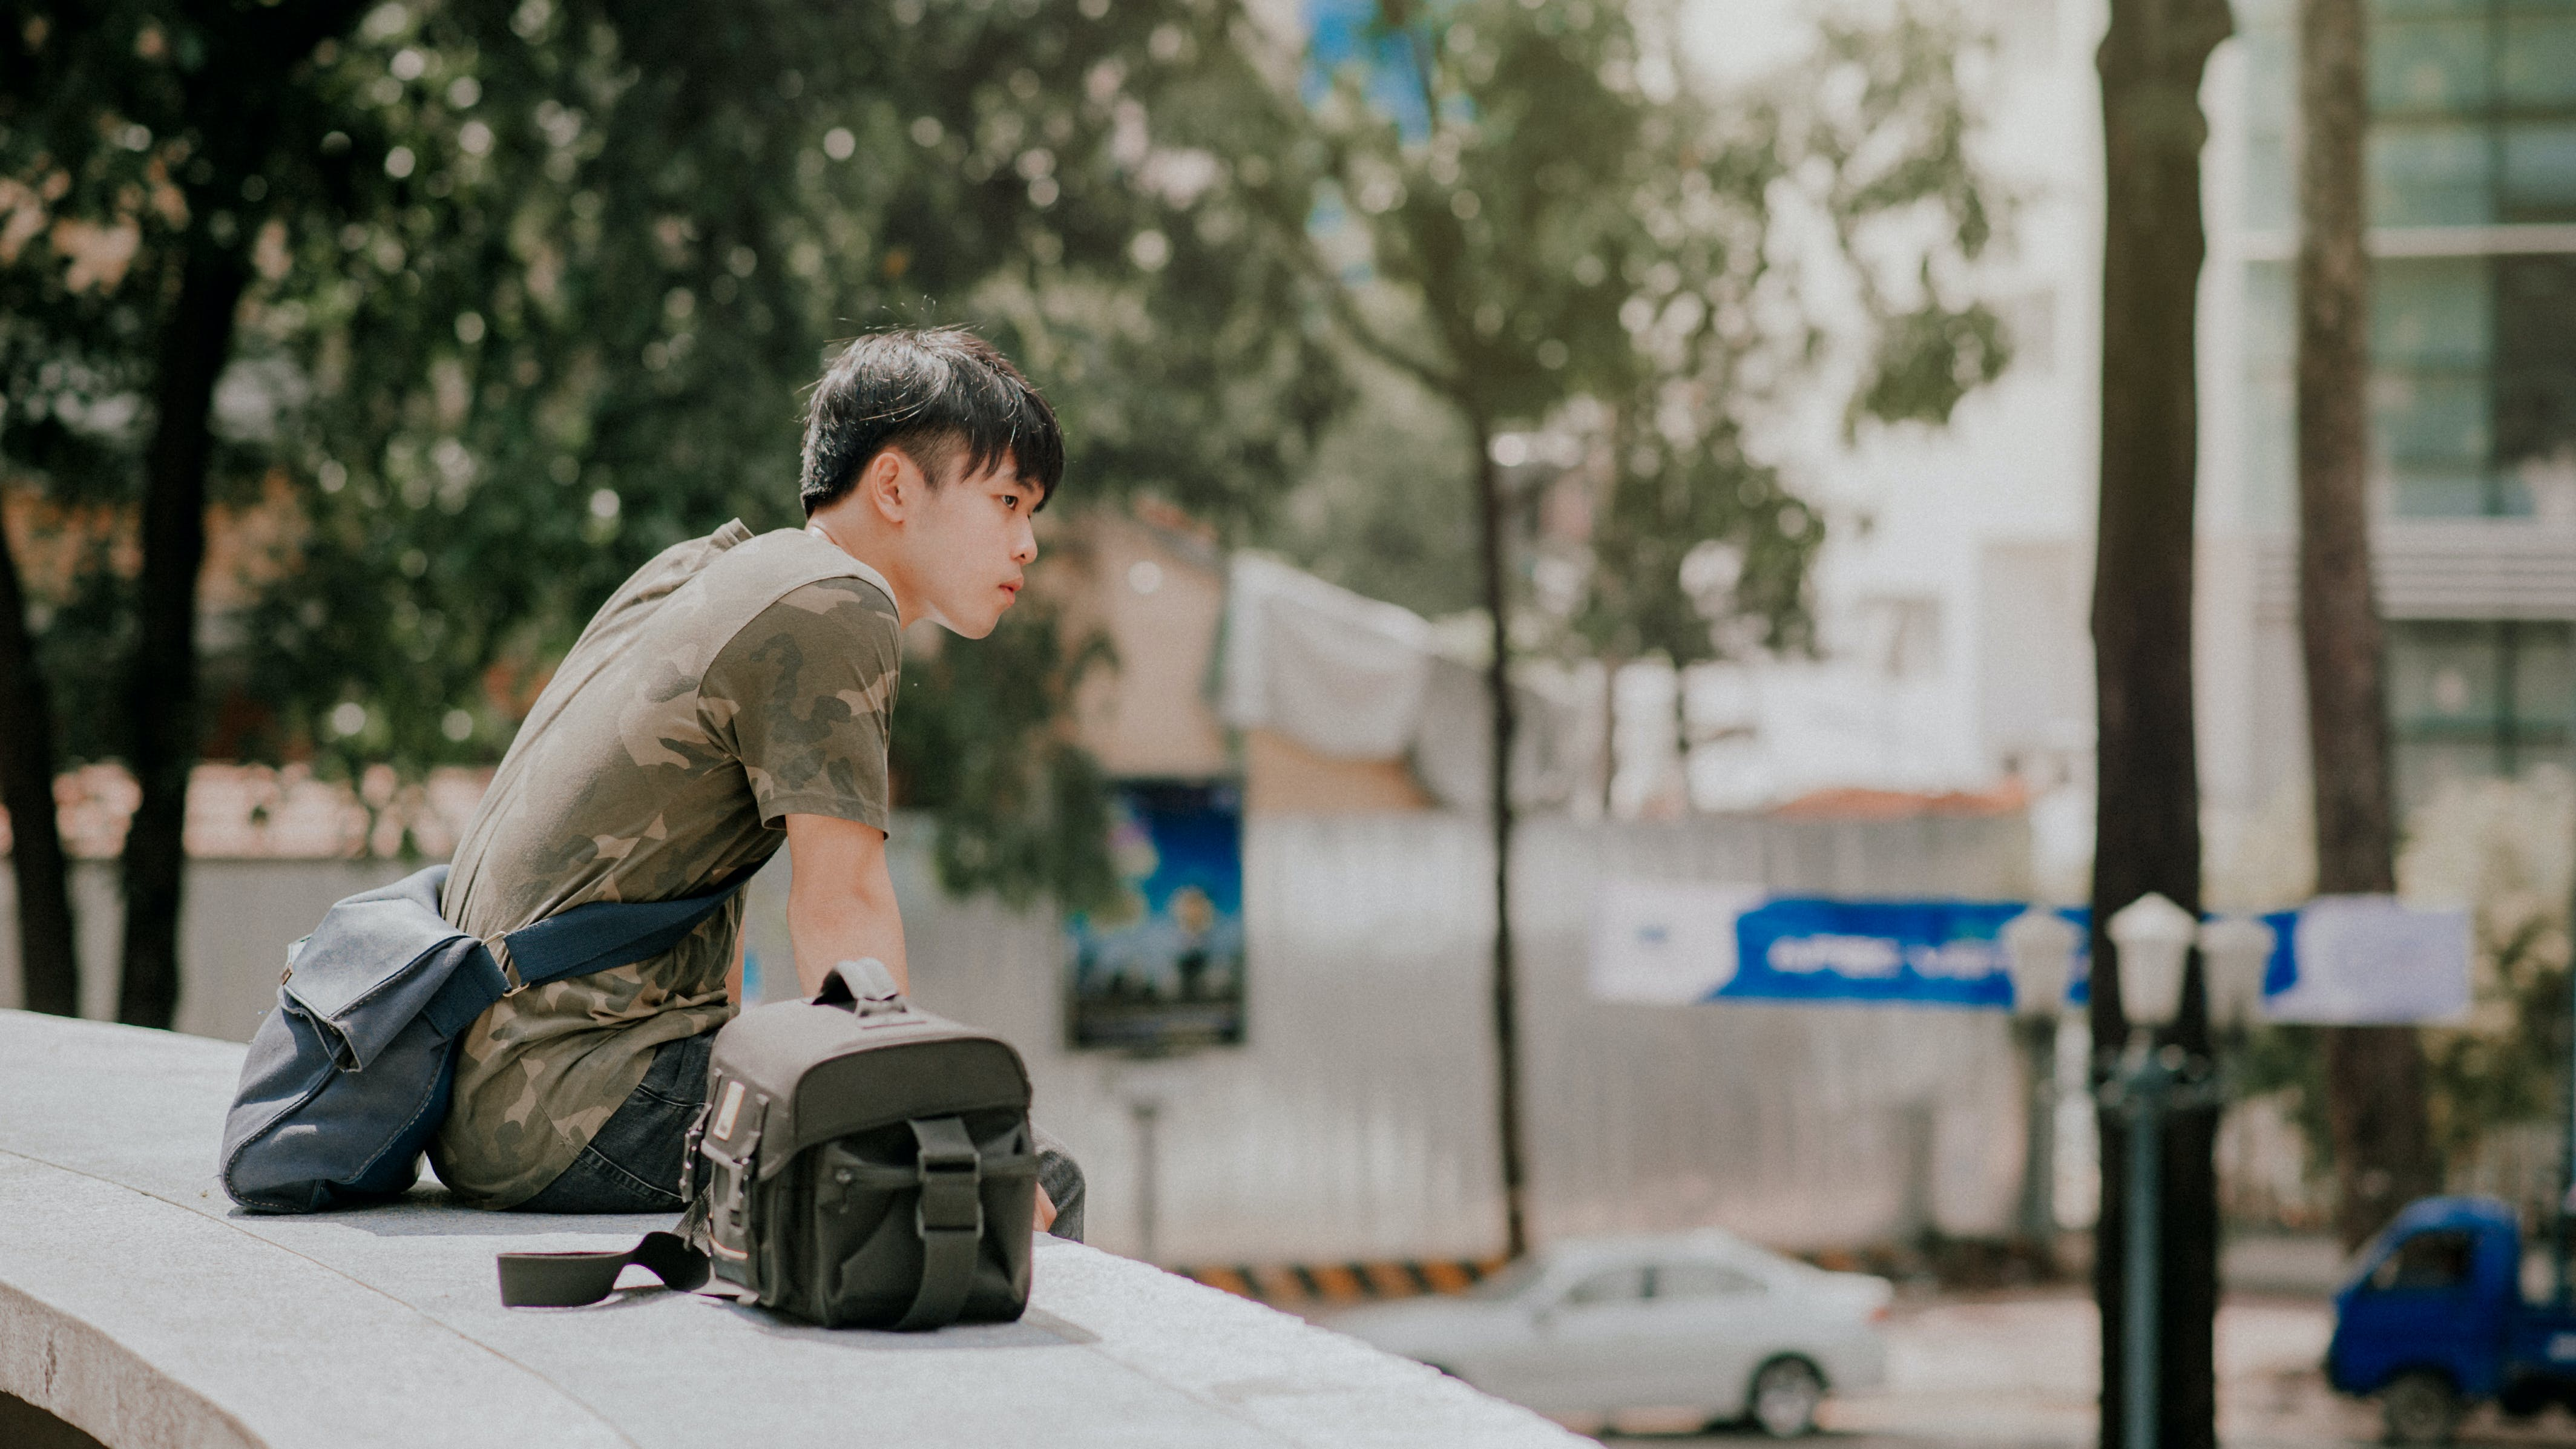 asiatisk mand, biler, by